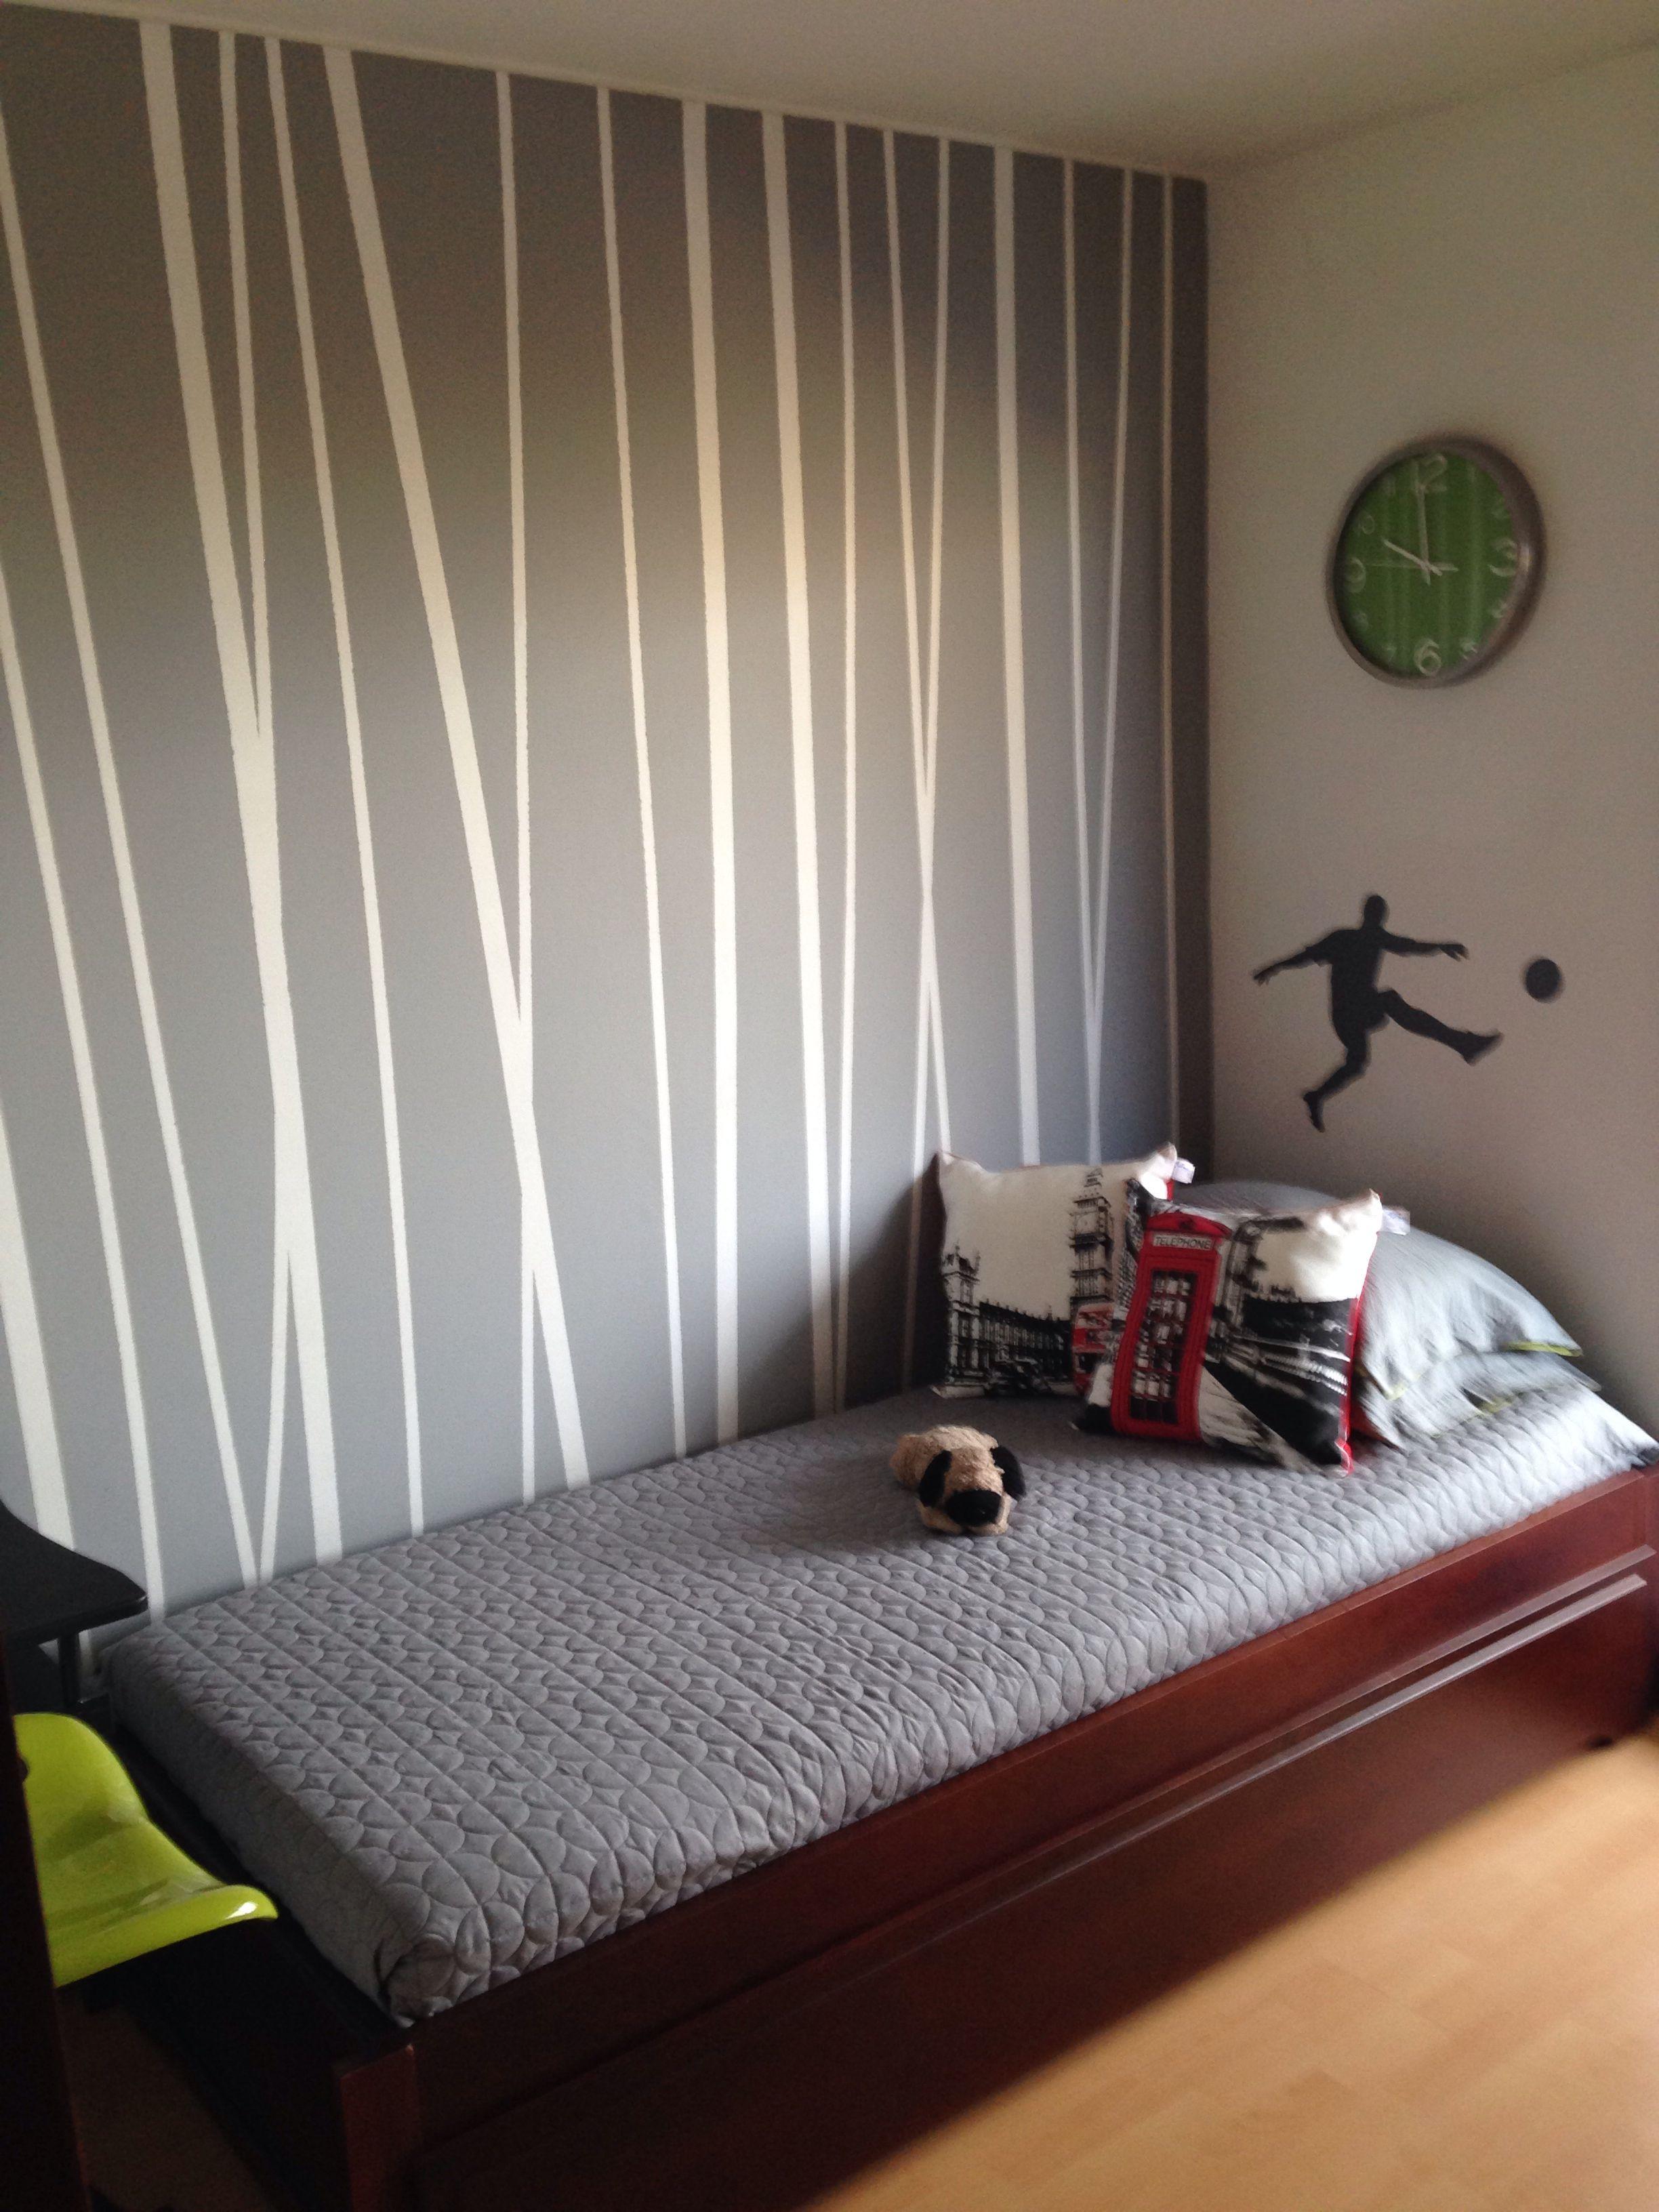 Transformar tu hogar es f cil y econ mico si sabes c mo - Pintar facil paredes ...